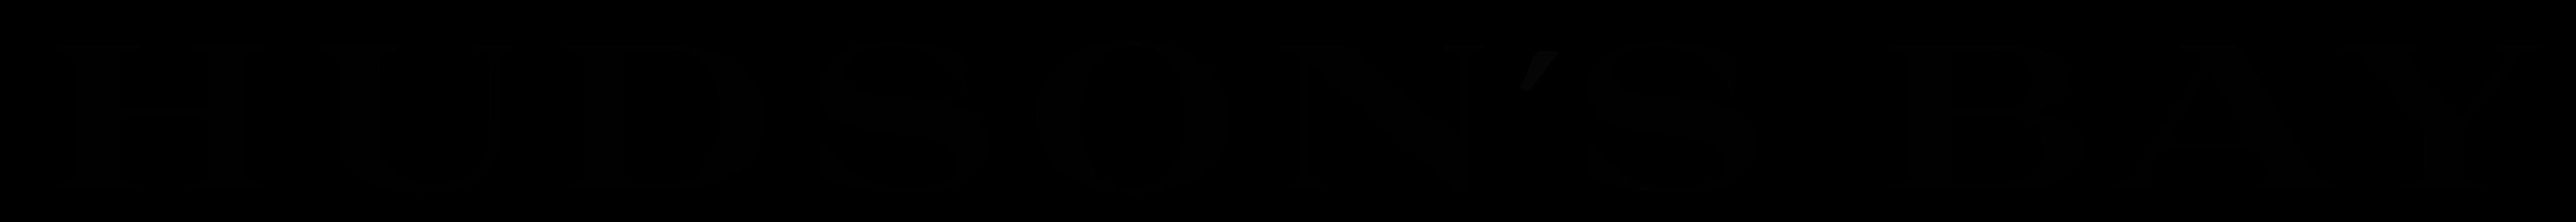 hudson u2019s bay logos download manchester united logo images manchester united logo history